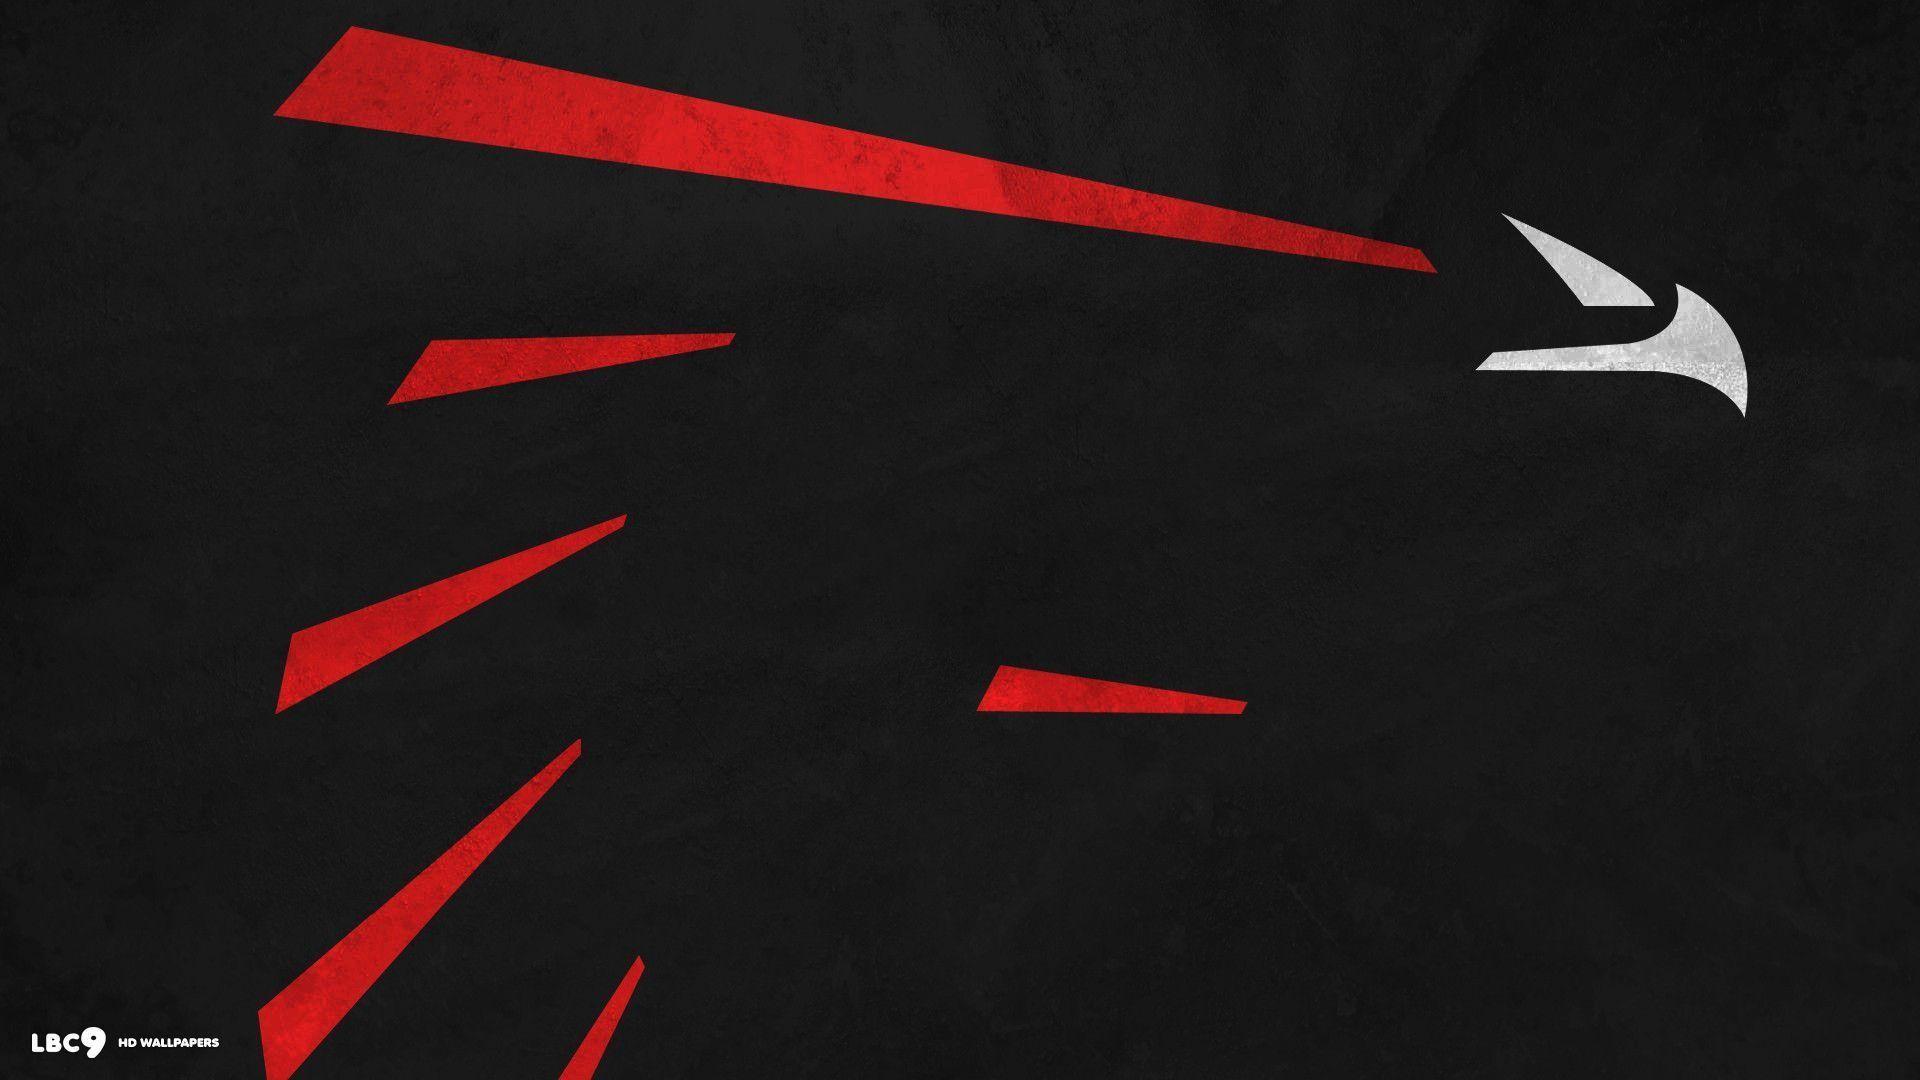 Atlanta Falcons Wallpaper For Mac Backgrounds: Atlanta Falcons Desktop Wallpaper ·① WallpaperTag